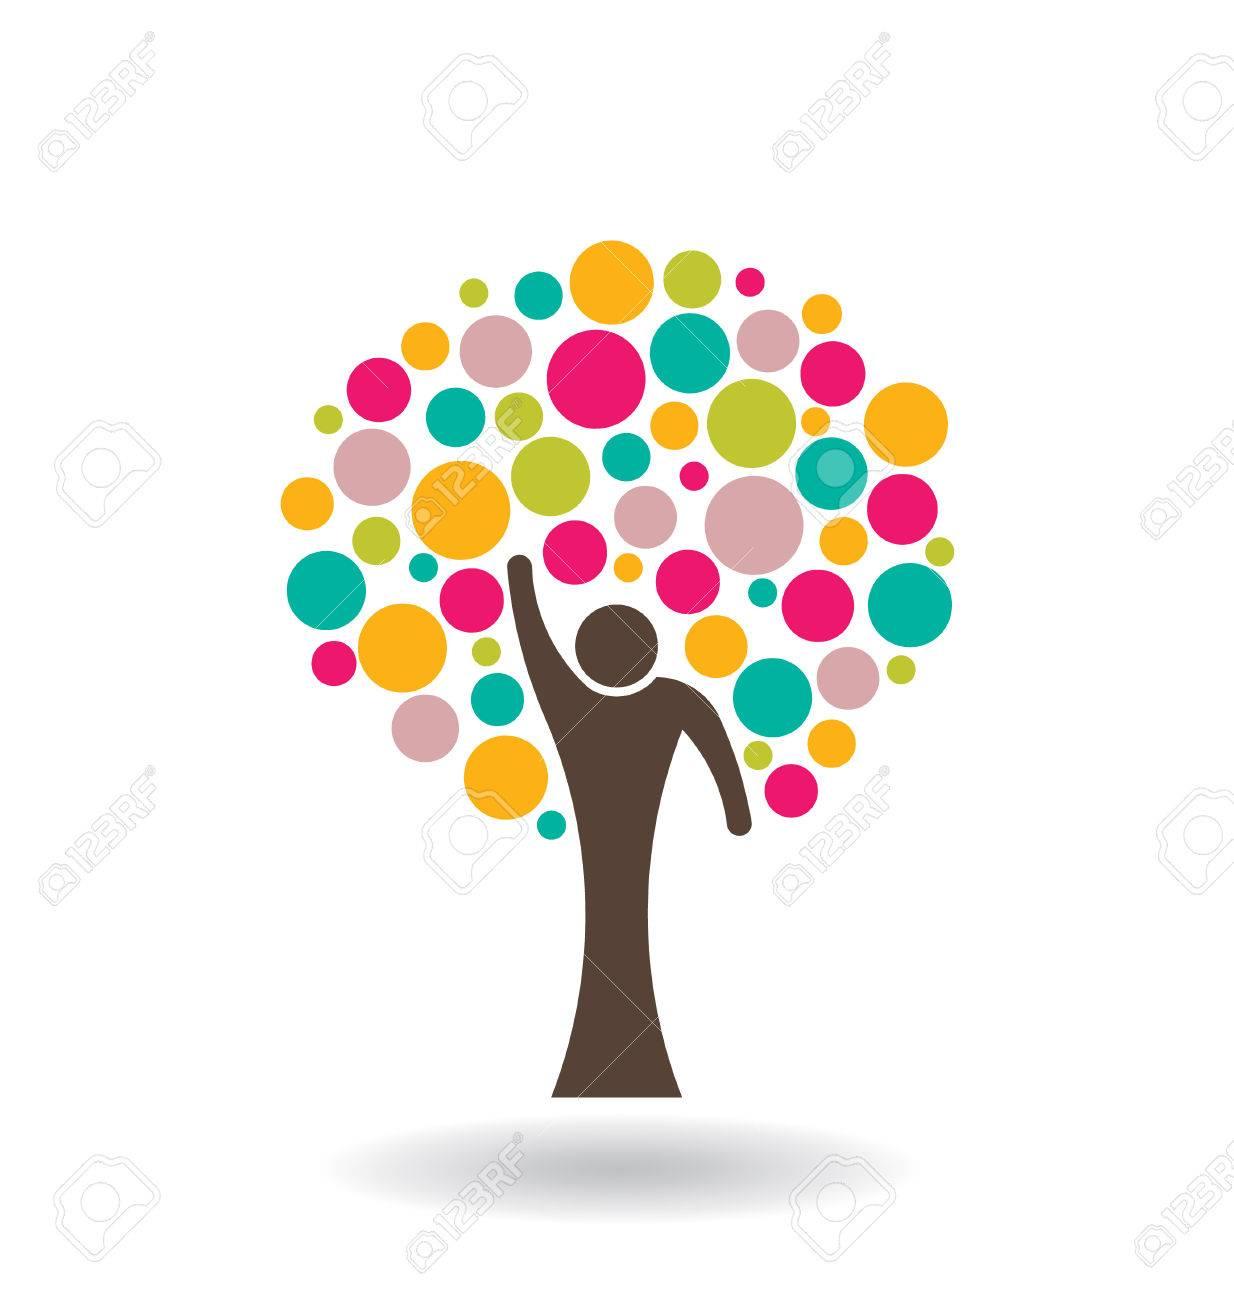 1234x1300 Circles Tree Of Life Royalty Free Cliparts, Vectors, And Stock